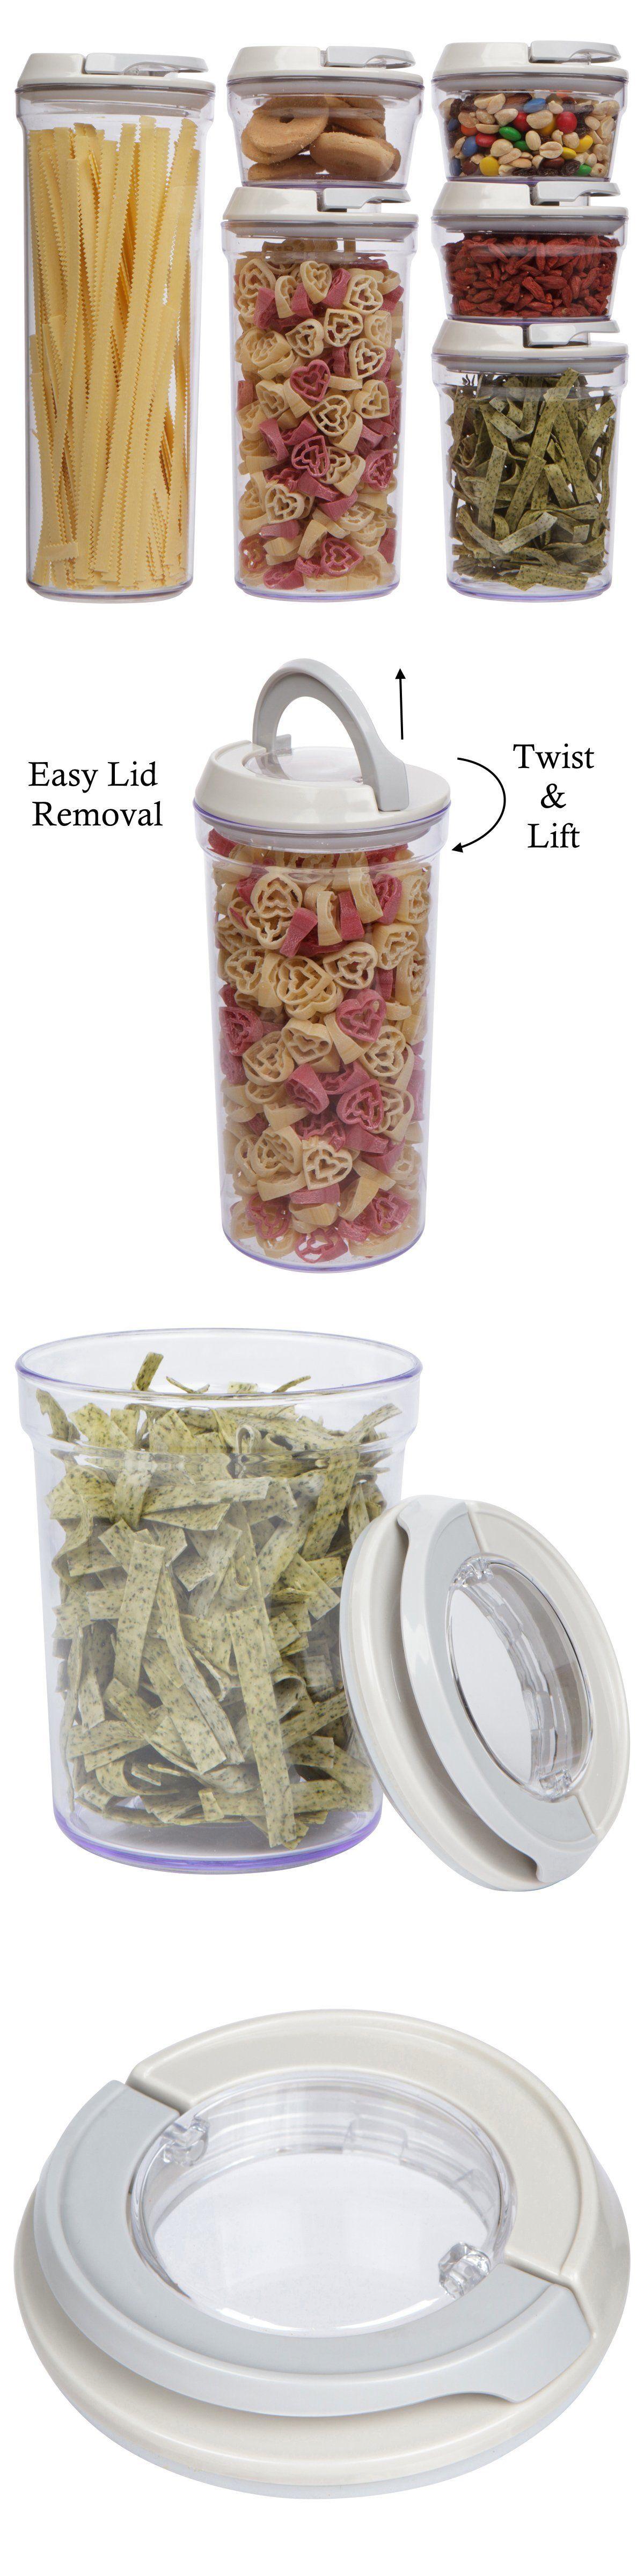 canisters and jars 20654 airtight clear acrylic canister set food canisters and jars 20654 airtight clear acrylic canister set food container 6 piece storage